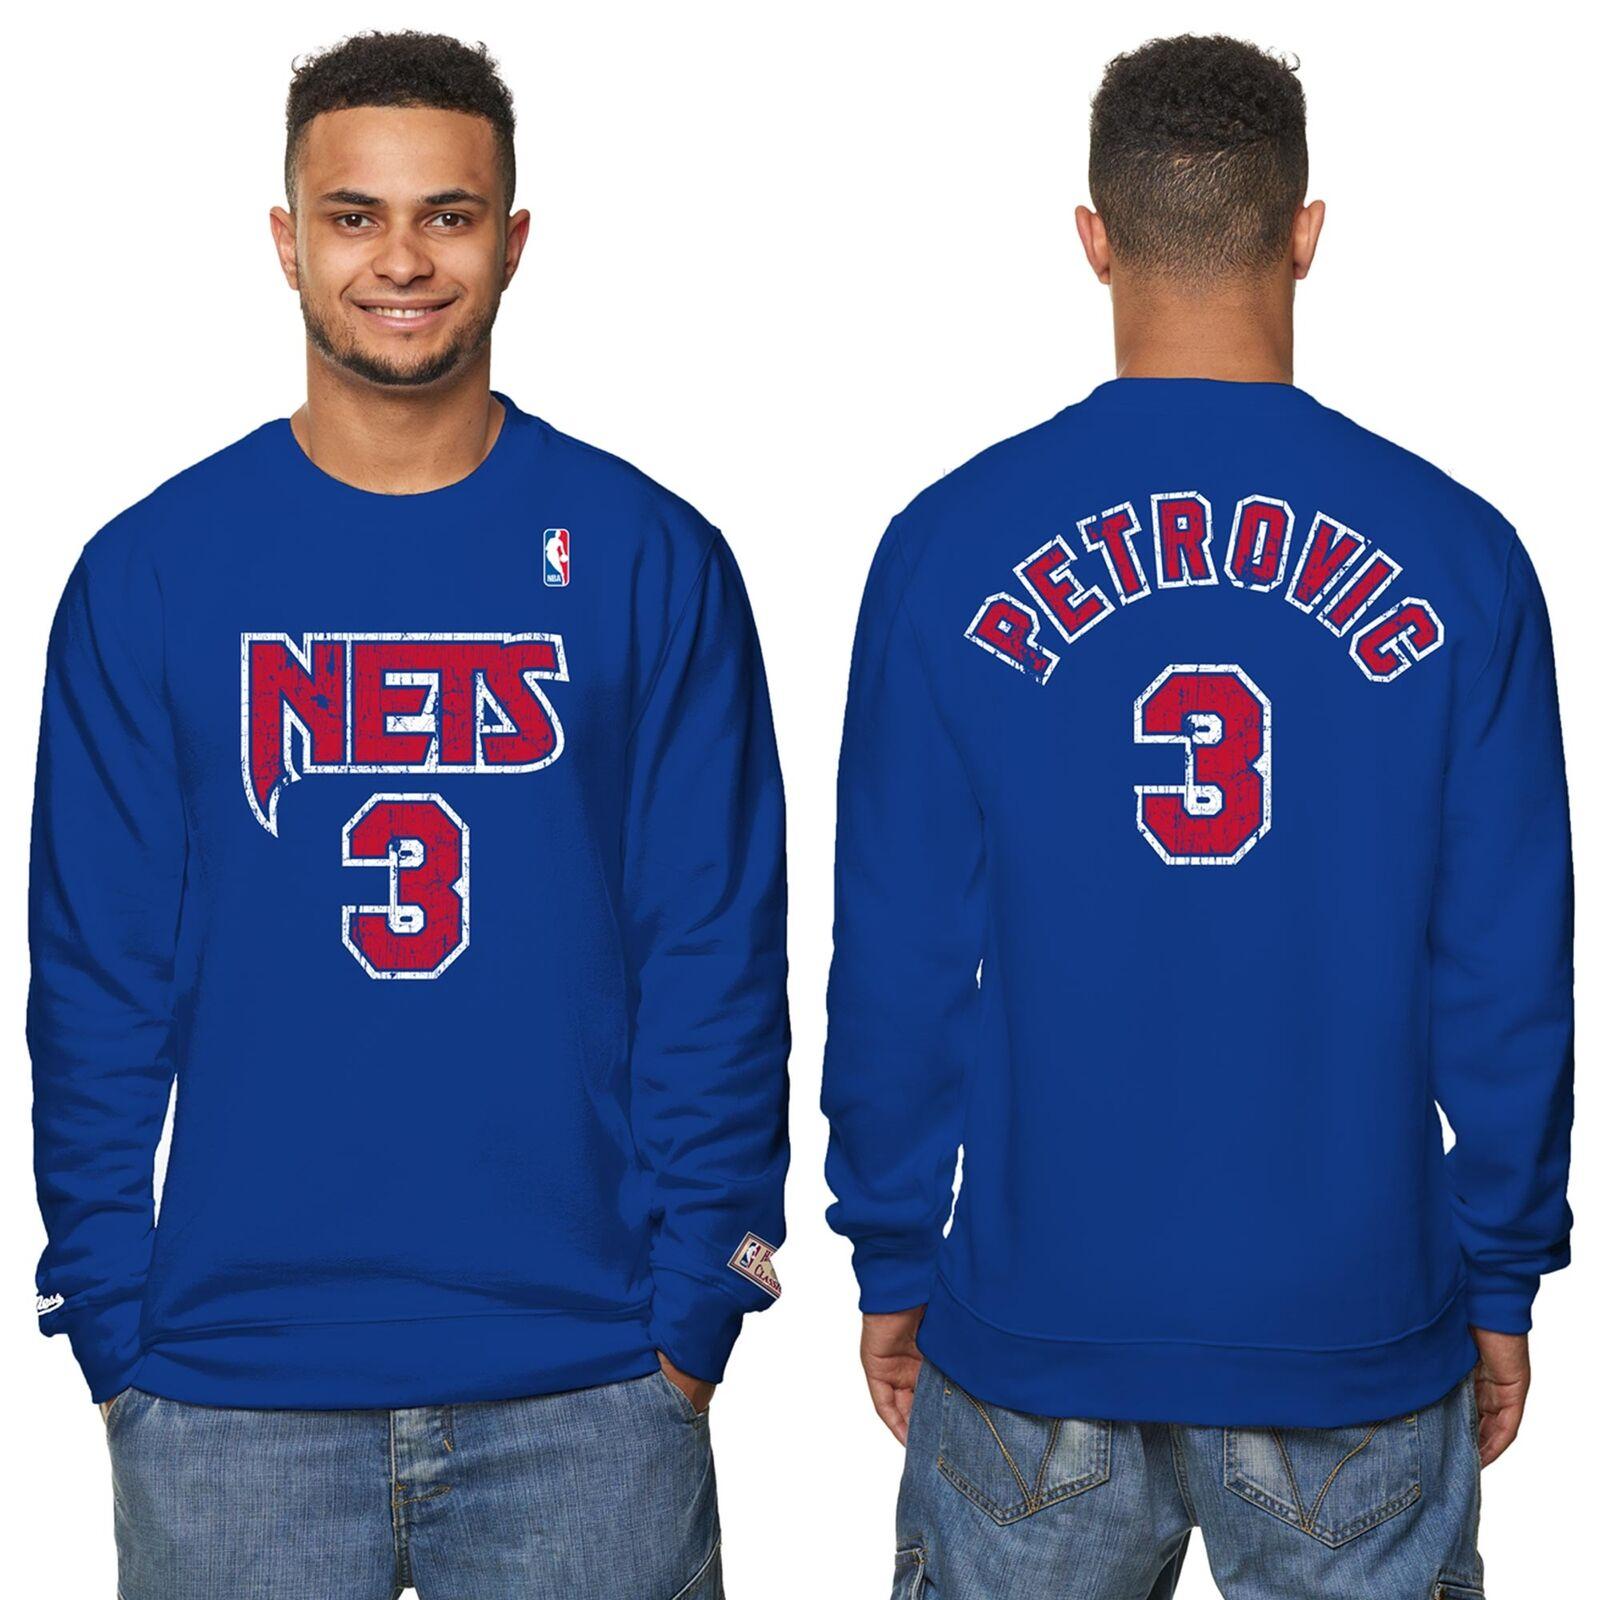 NBA NBA NBA New Jersey Nets Drazen Pettroviv Hardwood Sweatshirt Pulli Sweater Herren 0c0a3b